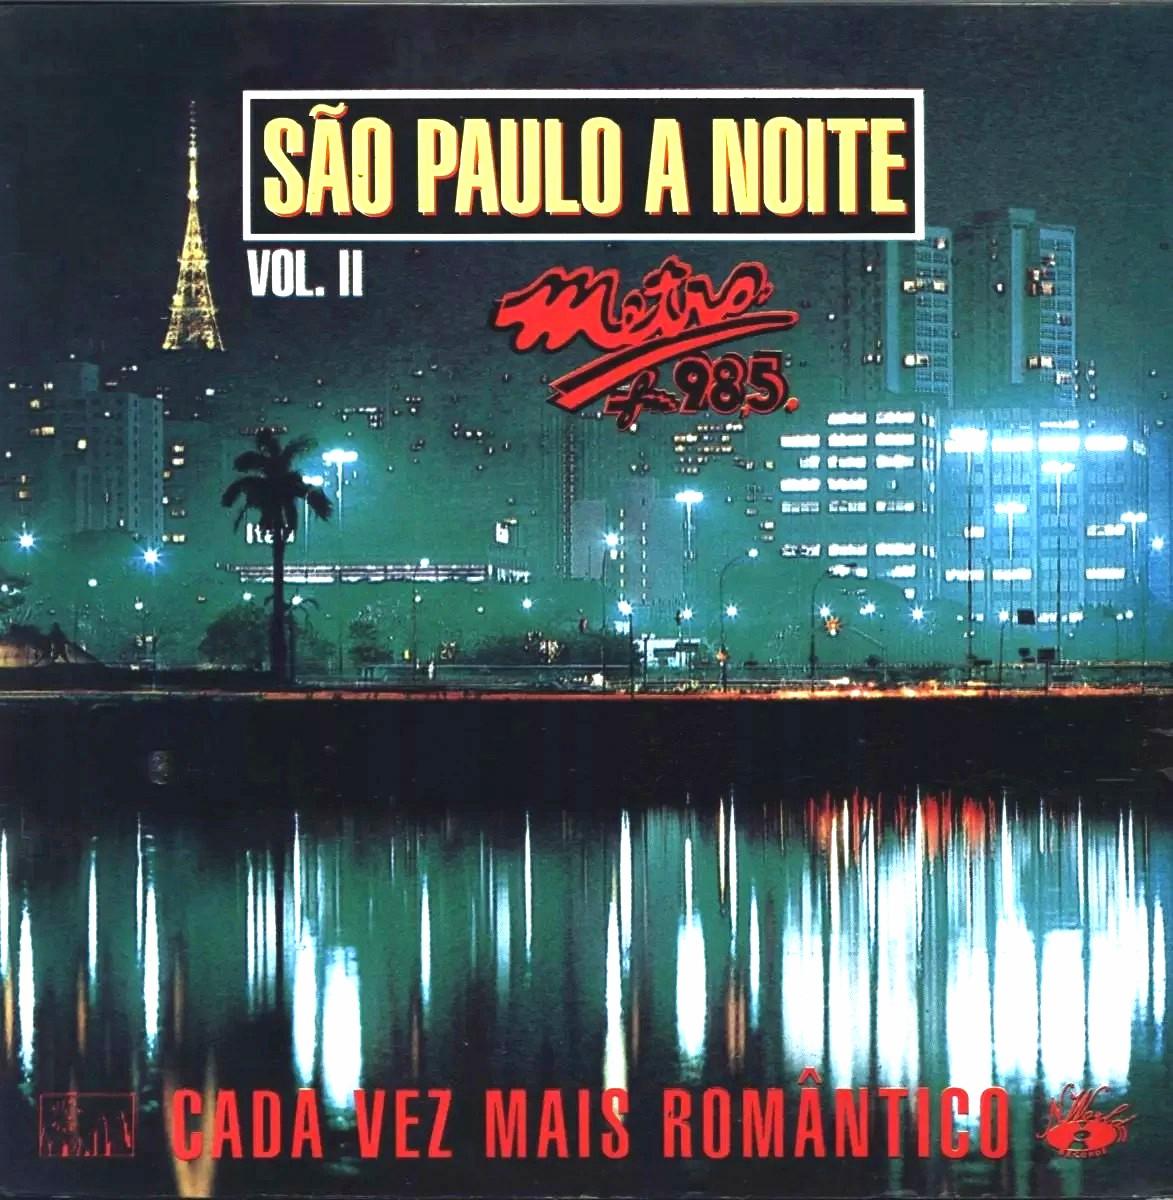 São Paulo A Noite Metrô FM 98,5  Vol. 2